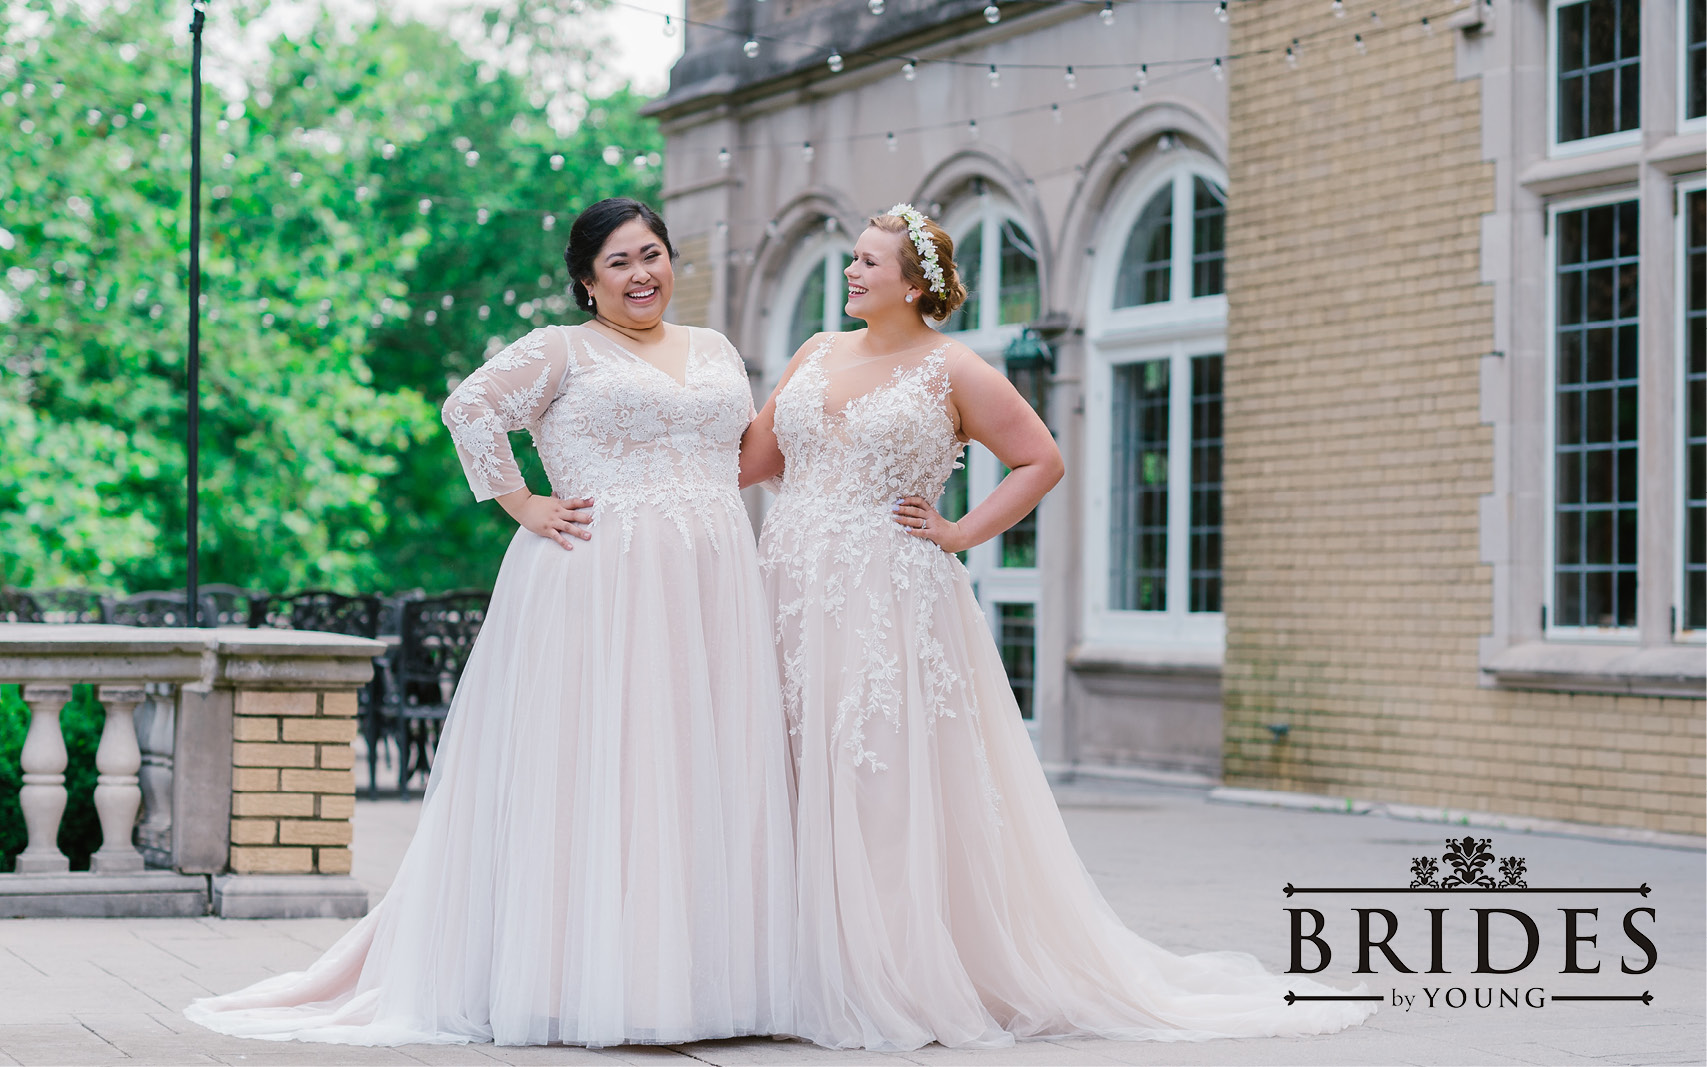 BridesbyYoung-2020Collection-PlusSizeBridalBoutique-CurvyWeddingDressInspiration-85.jpg